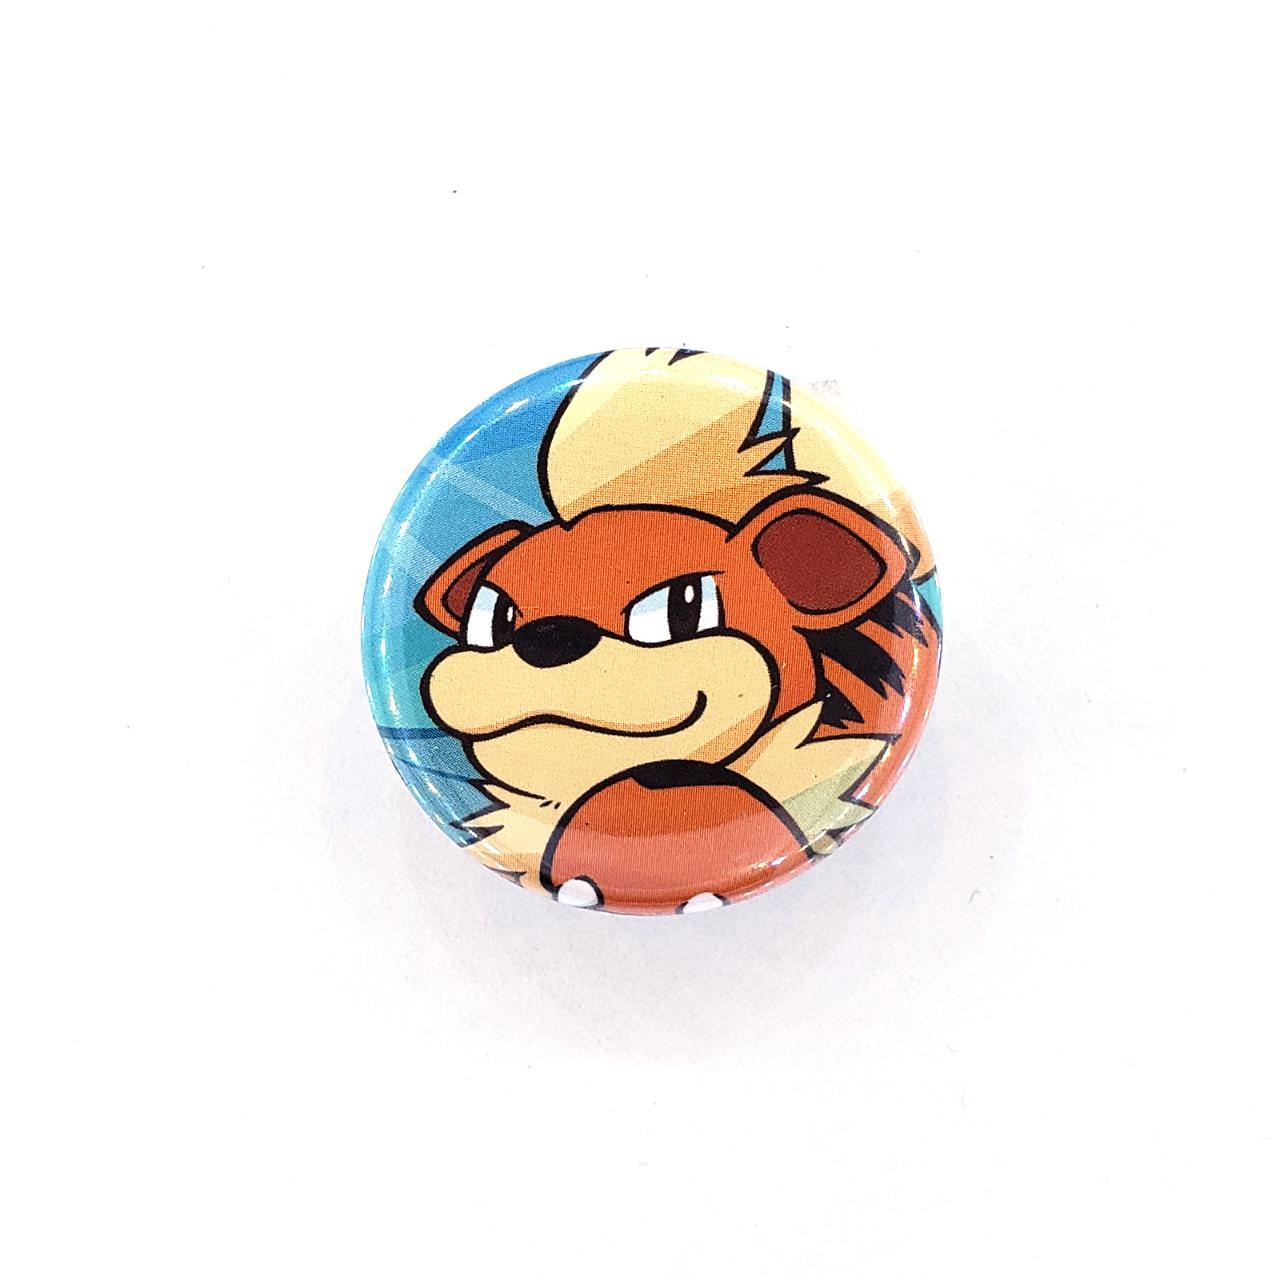 Product Image 1 - Growlithe Pokémon Collet Back Pin